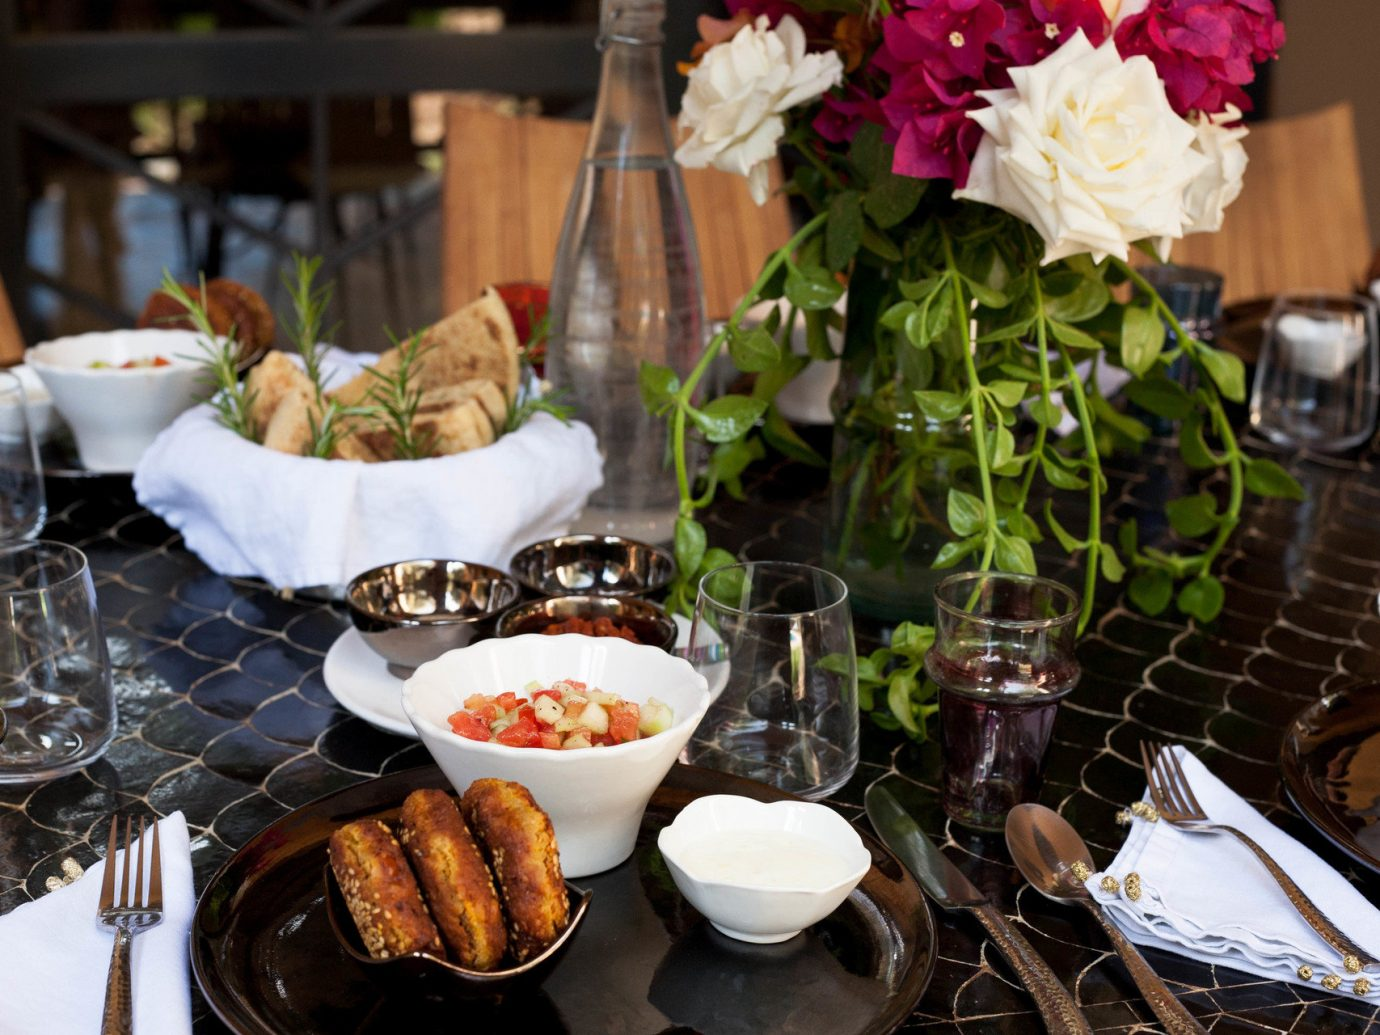 Hotels table plate food meal dish brunch dinner lunch buffet flower supper breakfast sense restaurant cuisine dining table